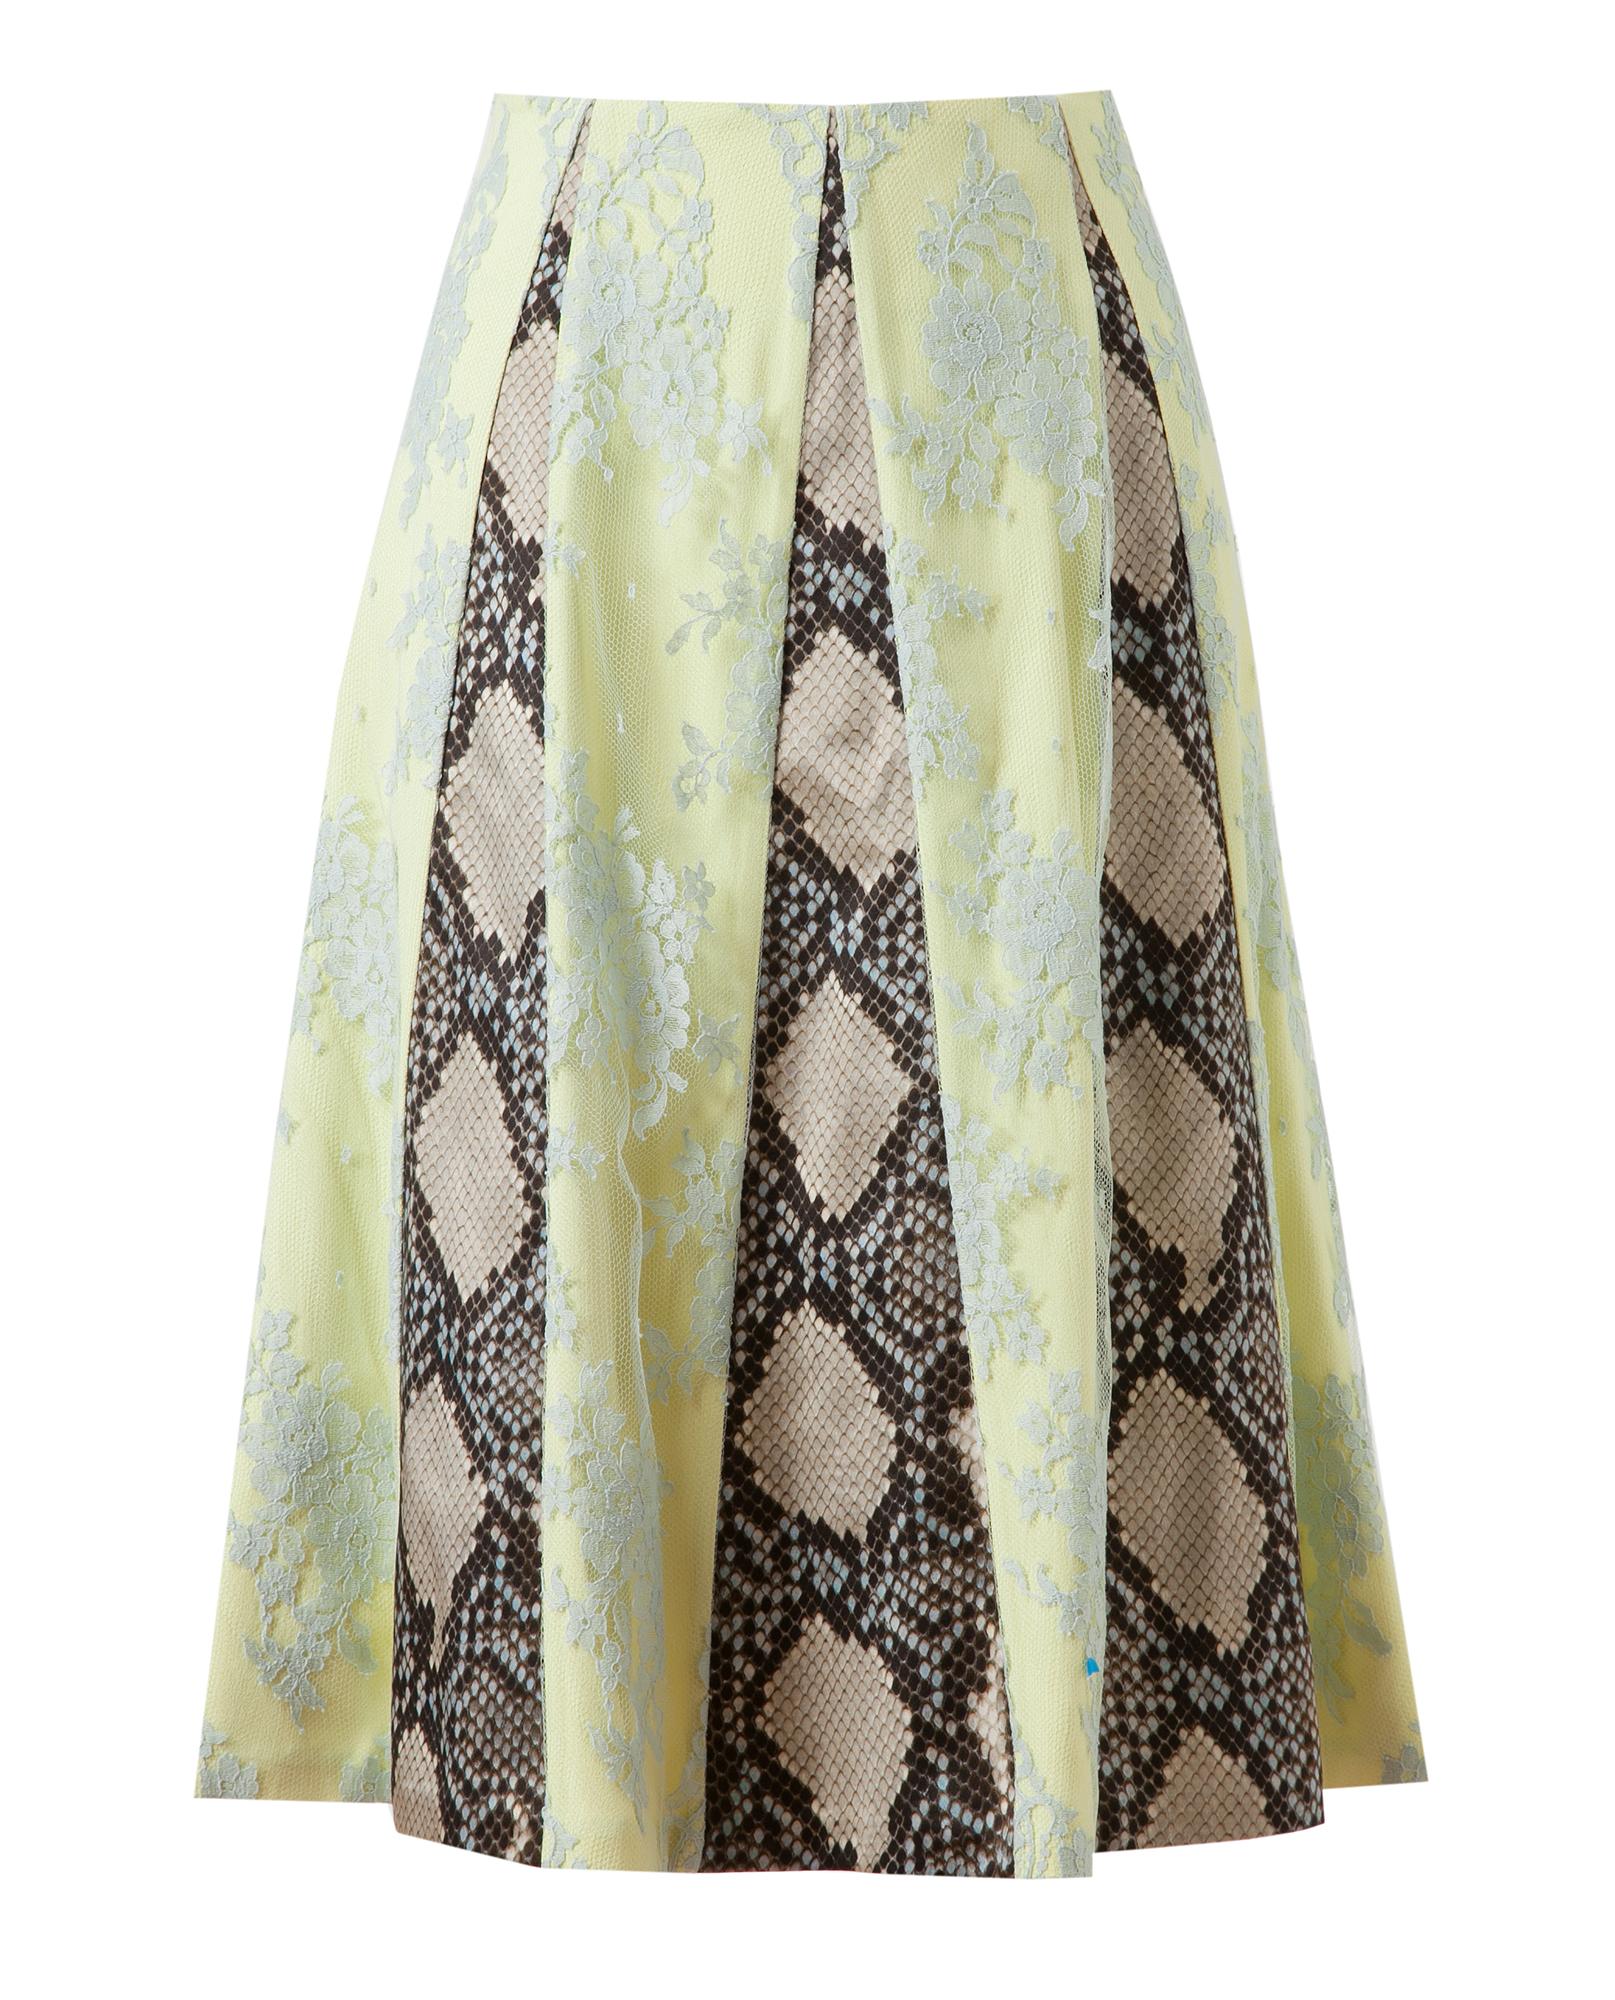 Buy Cheap Newest Erdem Woman Mari Floral-print Crepe Mini Skirt White Size 12 Erdem Discount Manchester Great Sale Store Sale Online Great Deals Cheap Online Sneakernews Cheap Online fbkLSnpjt0